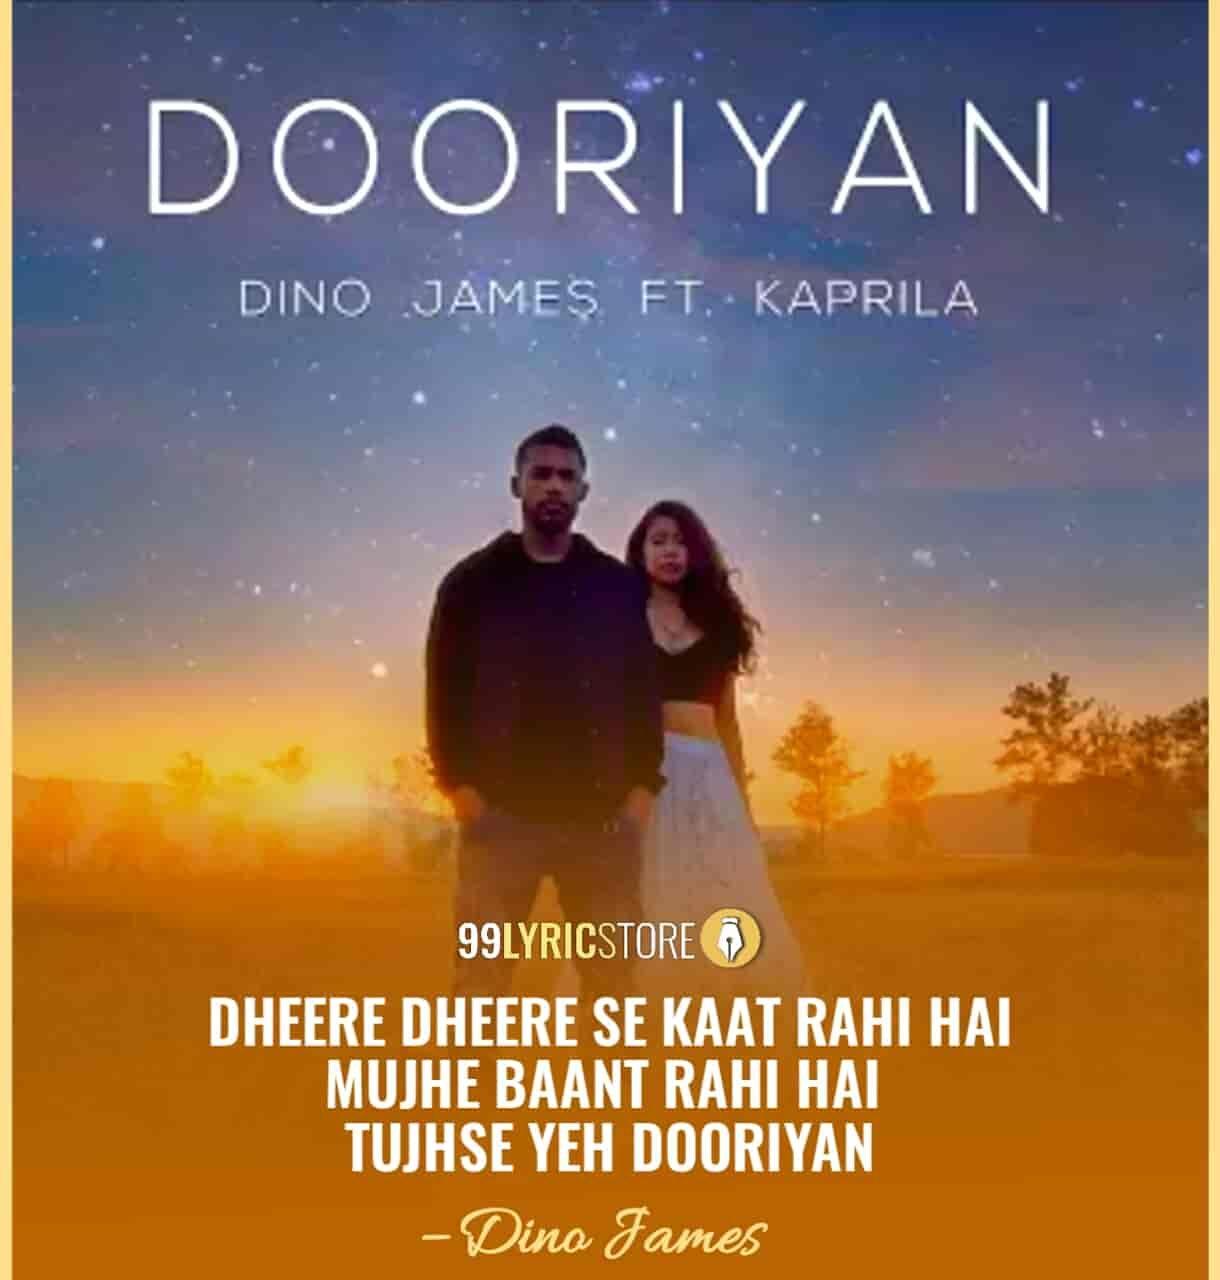 Dooriyan lyrics dino james lyrics beautiful lyrics